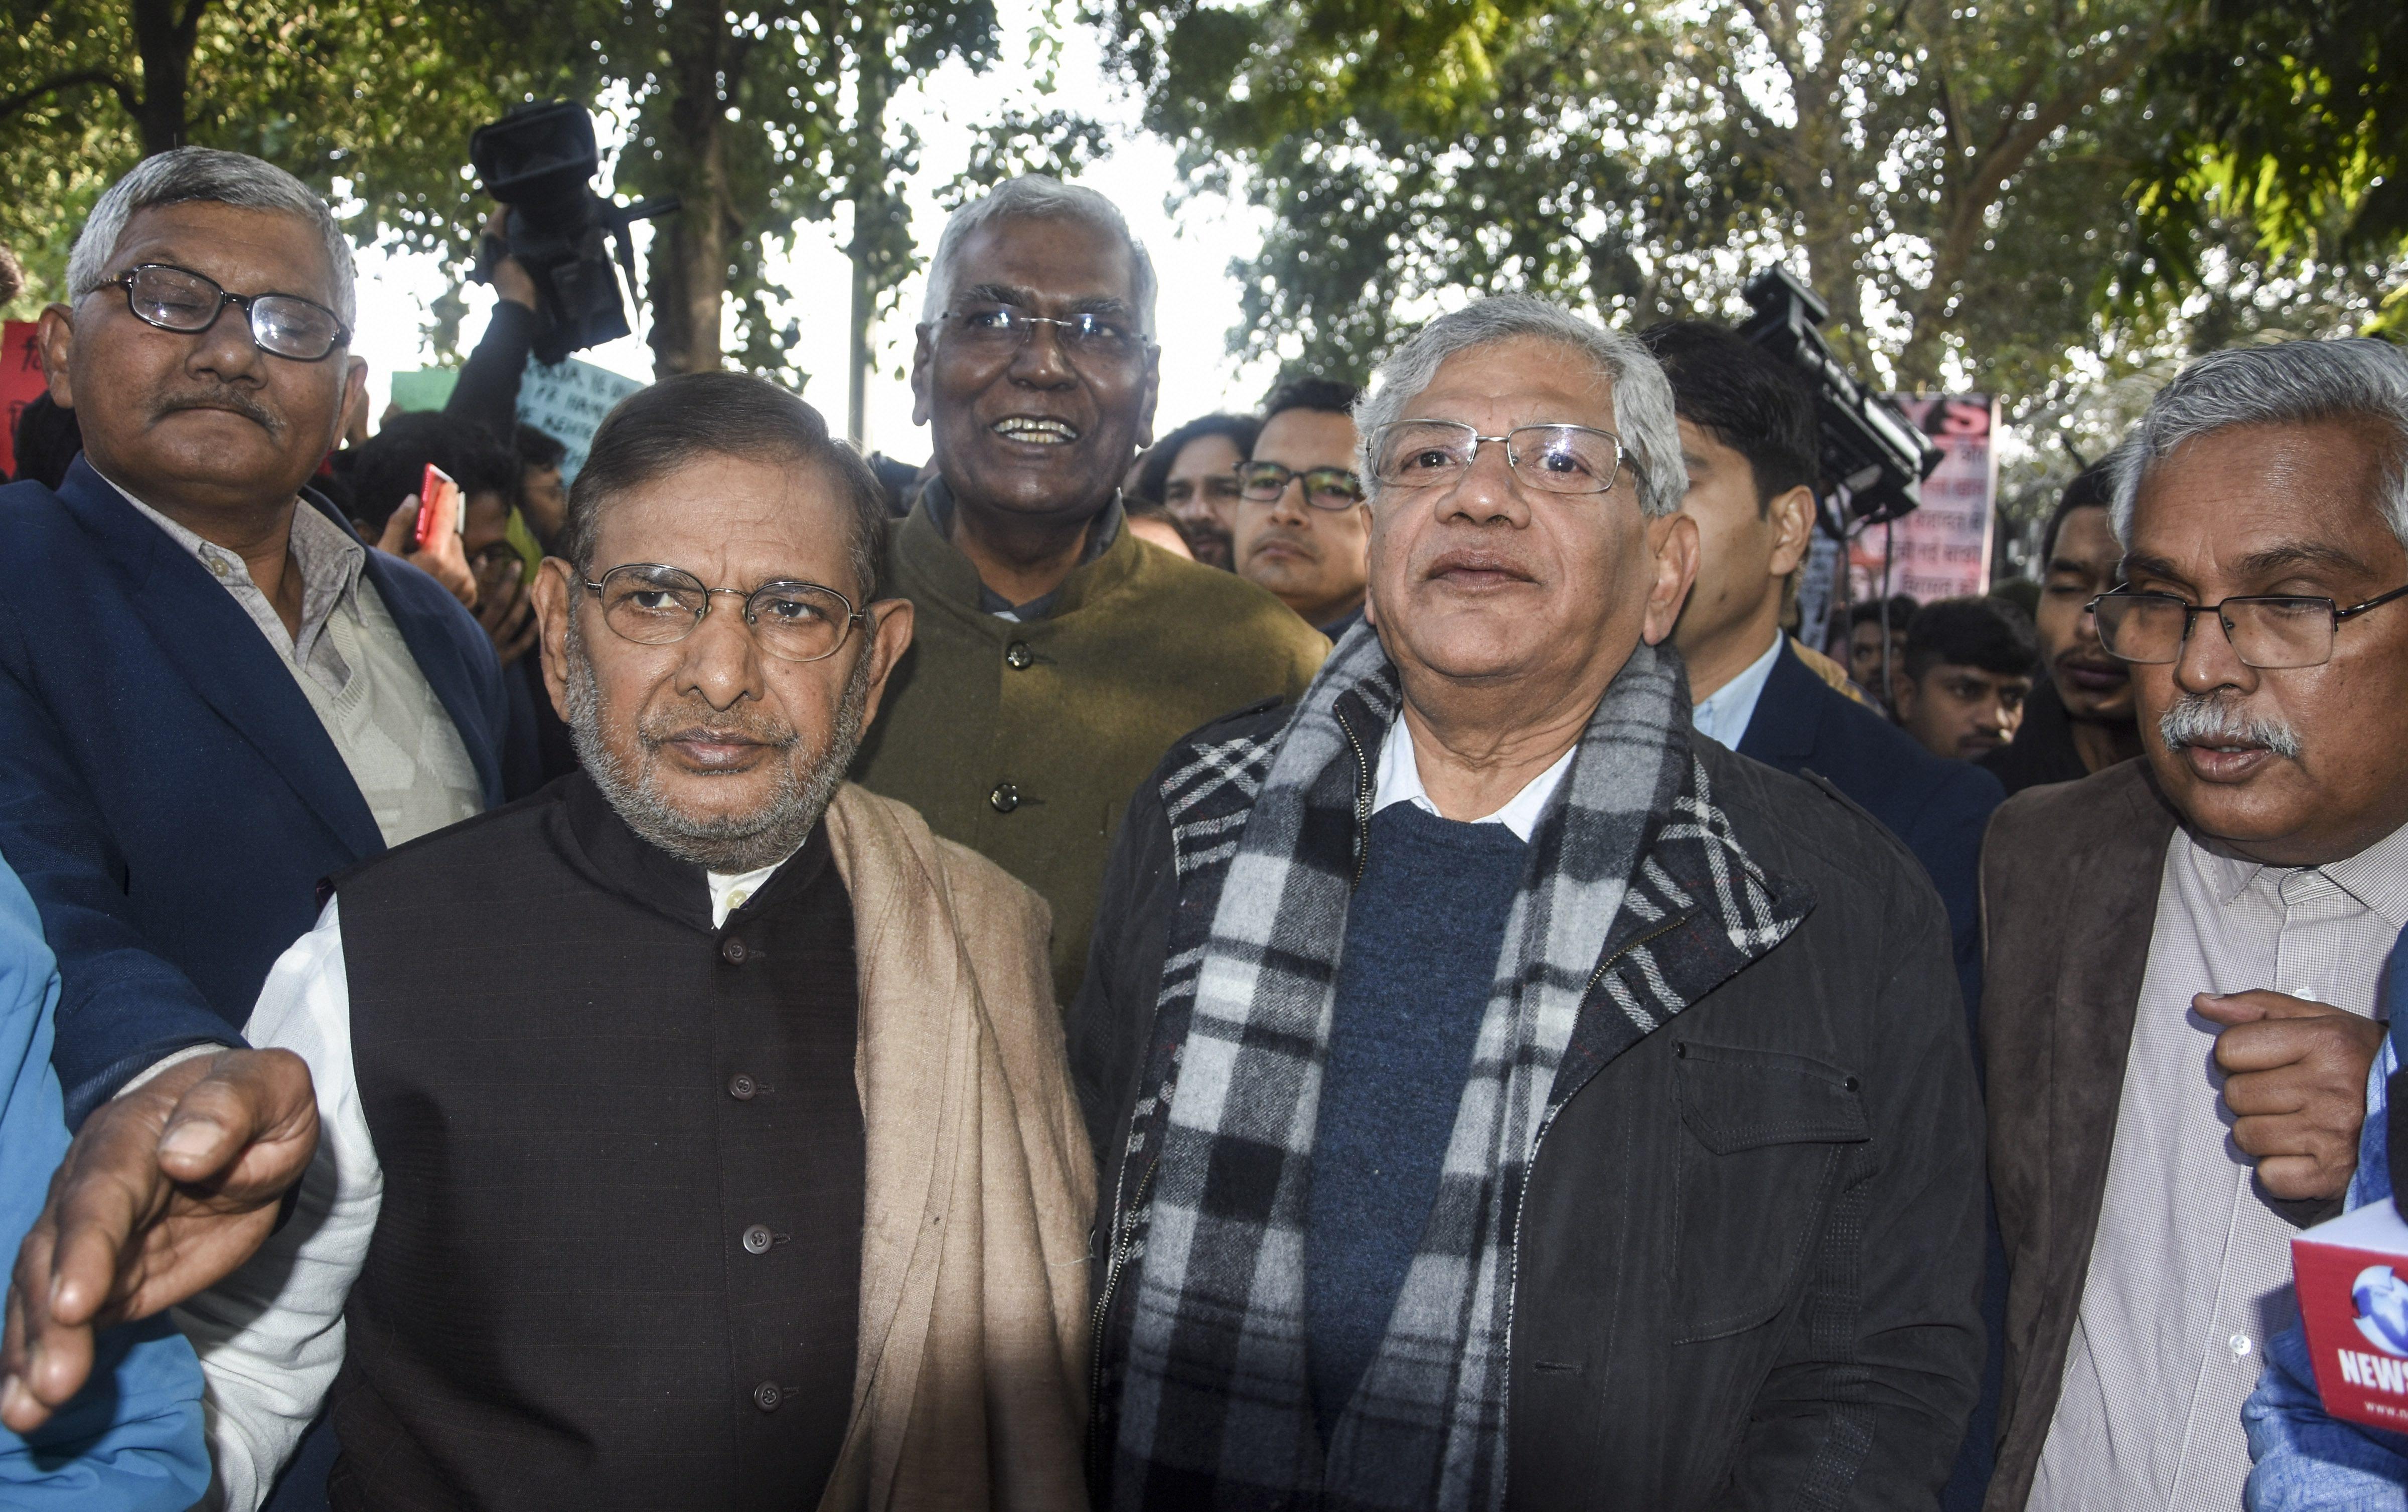 LJD leader Sharad Yadav, CPI(M) general secretary Sitaram Yechury and CPI general secretary D. Raja at the citizens' march at Mandi House in New Delhi on Thursday, Janaury 9, 2019